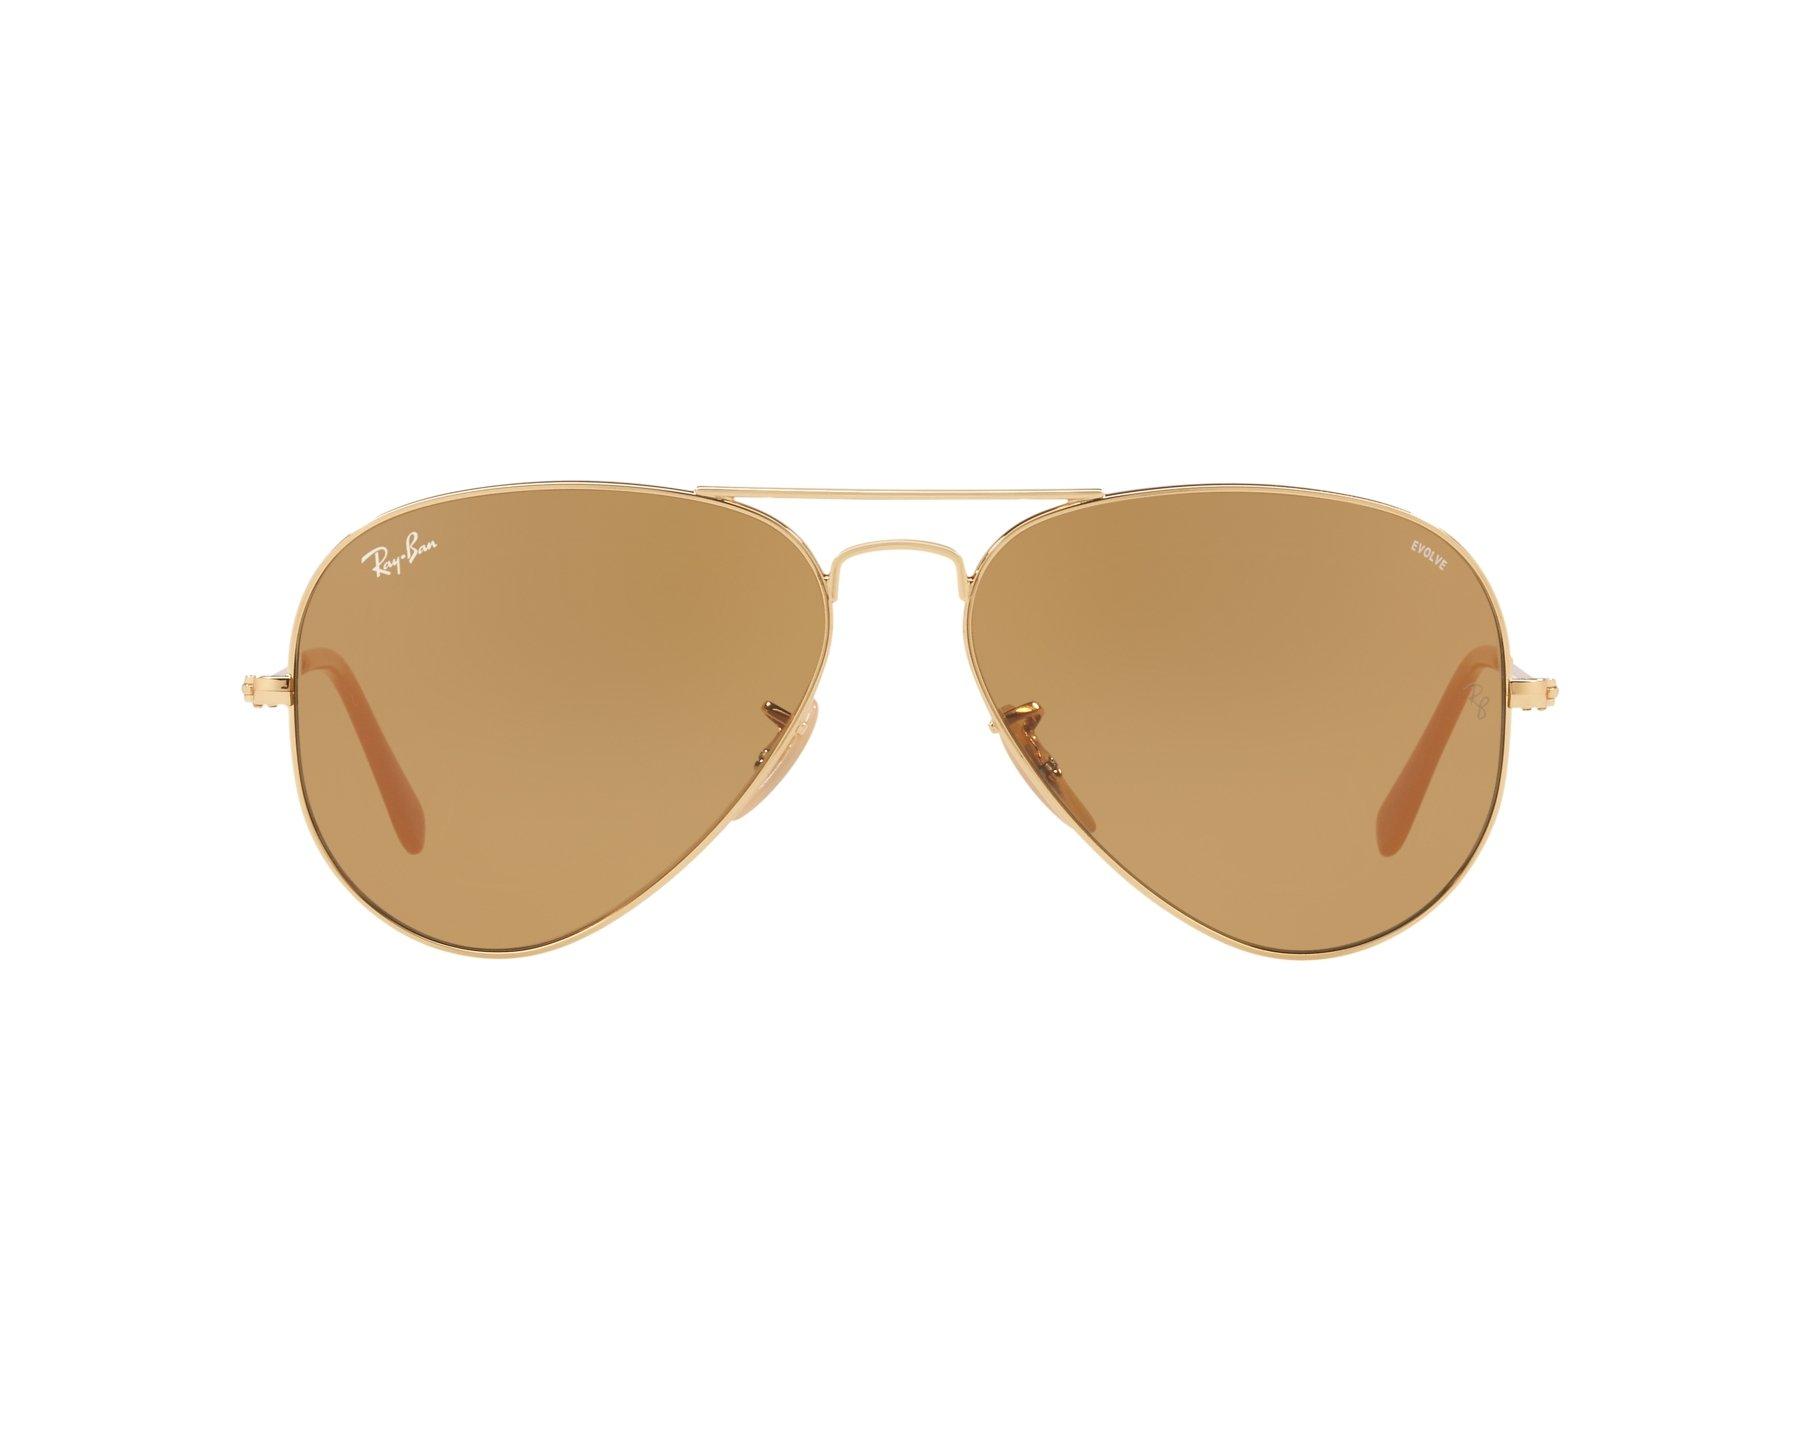 Sunglasses Ray-Ban Aviator metal RB-3025 - 90644l 5f5daa607471